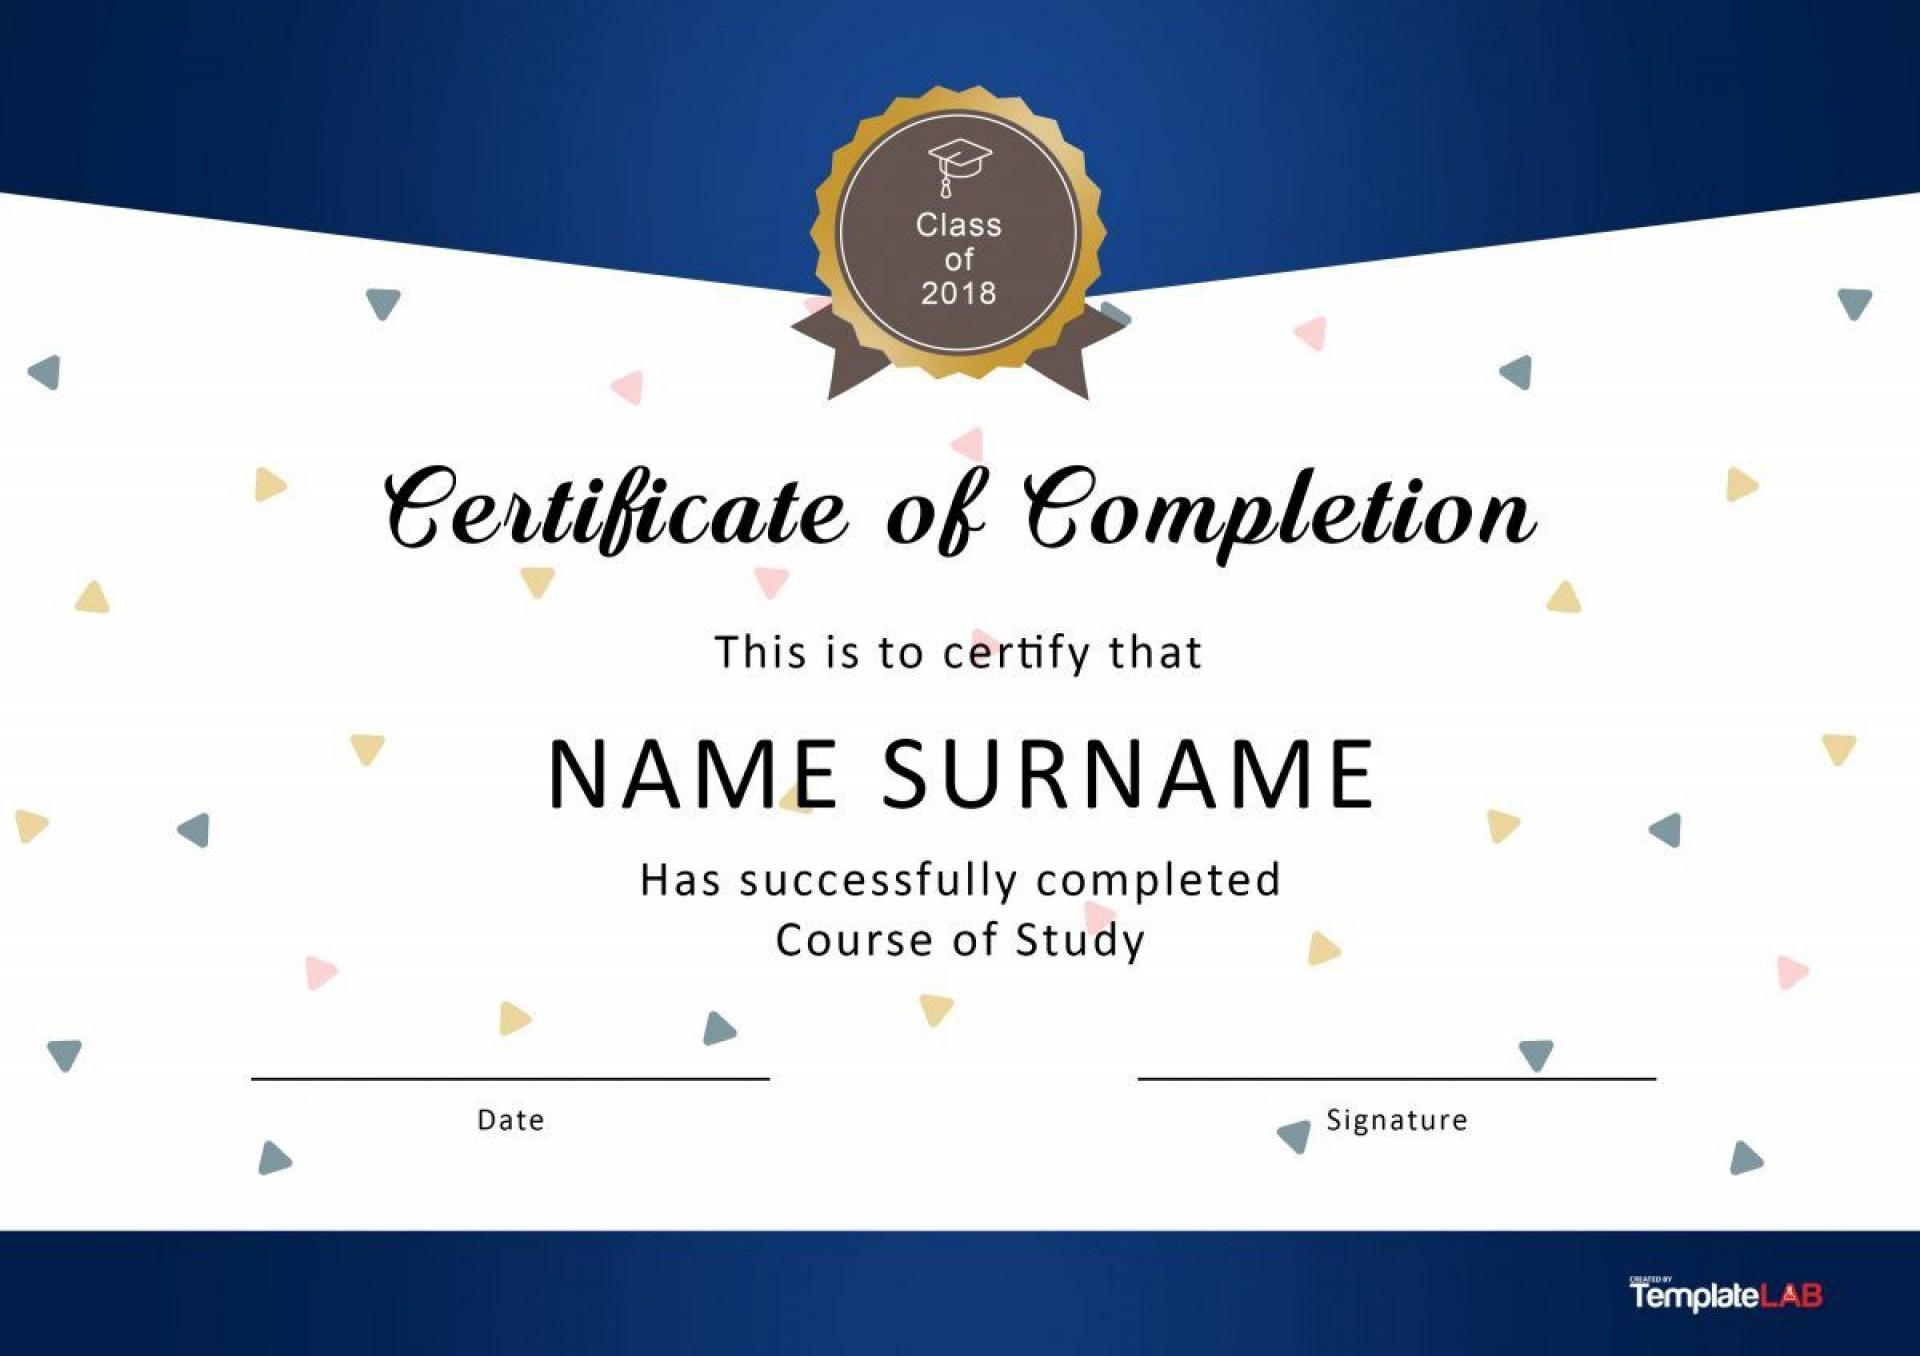 006 Striking Degree Certificate Template Word High Resolution 1920